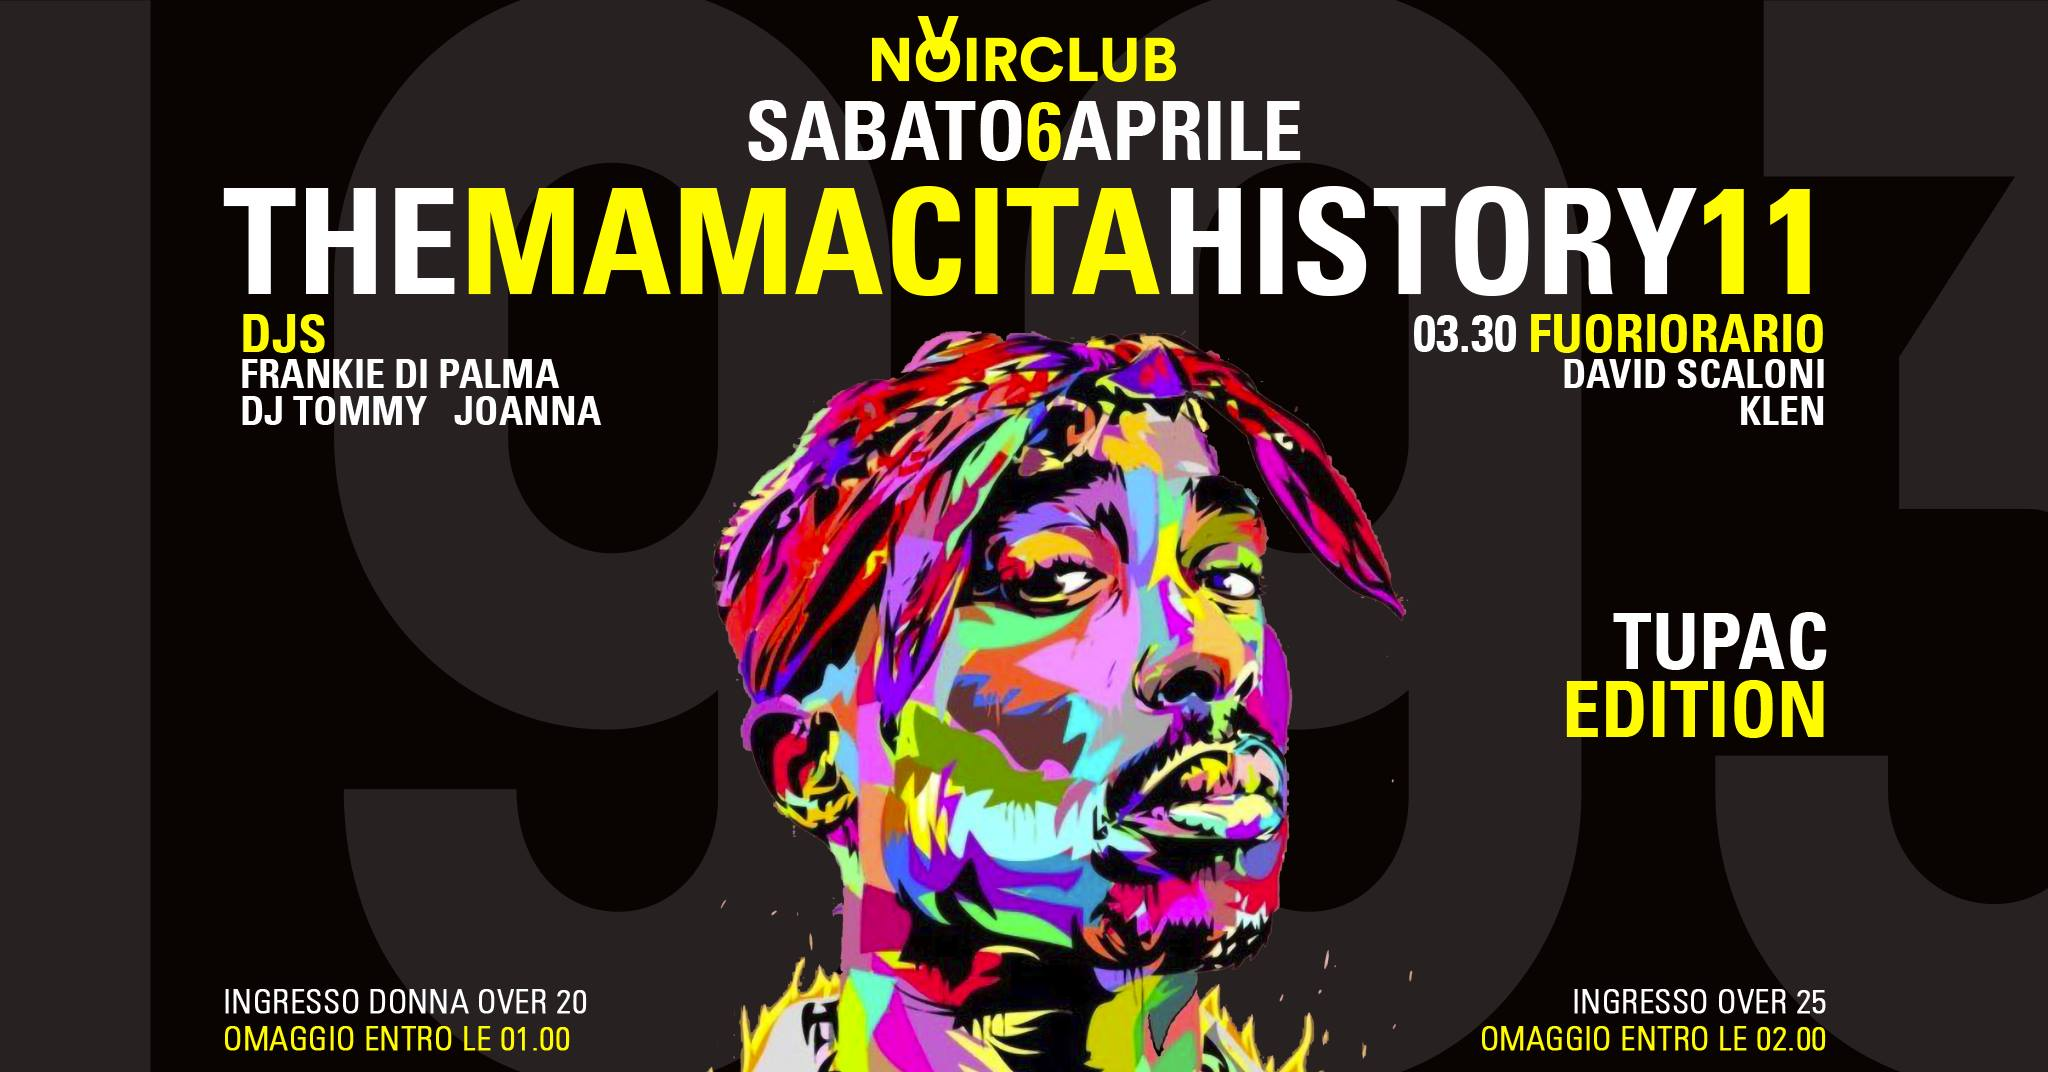 Tupac Edition Noir Club Jesi